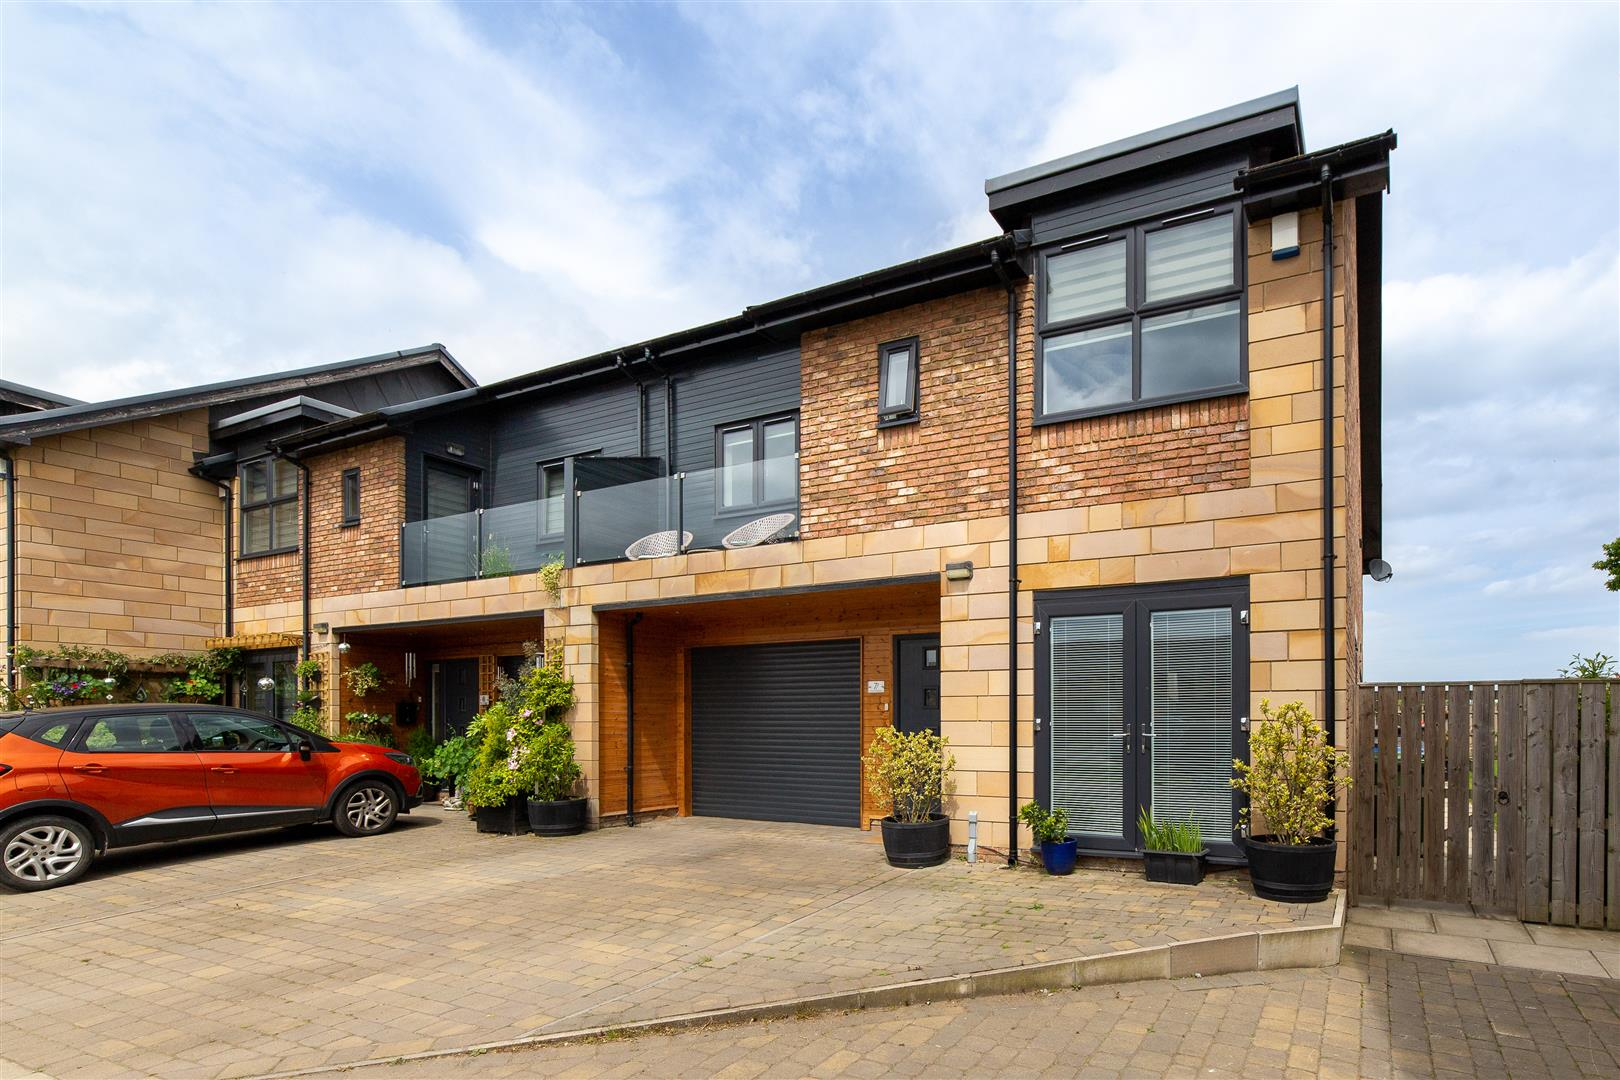 3 bed end of terrace house for sale in Arcot Grange, Cramlington, NE23